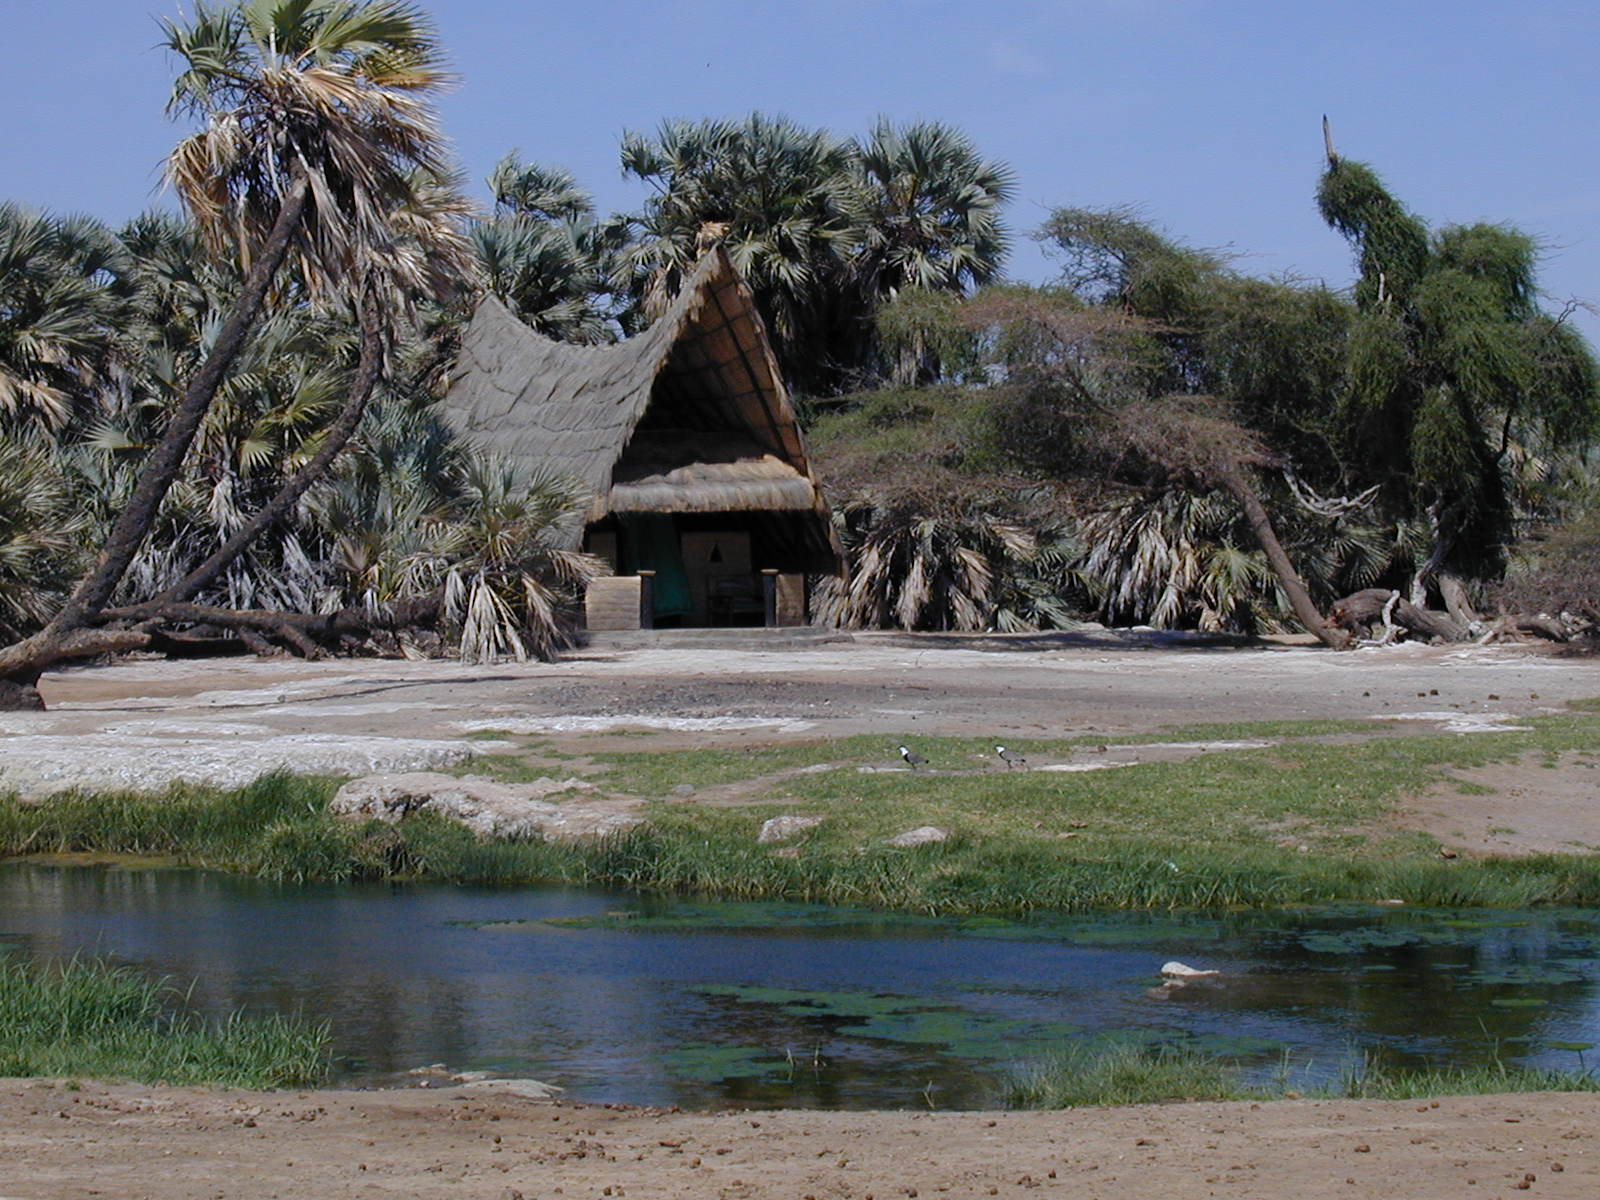 Kalacha Kenya Exterior